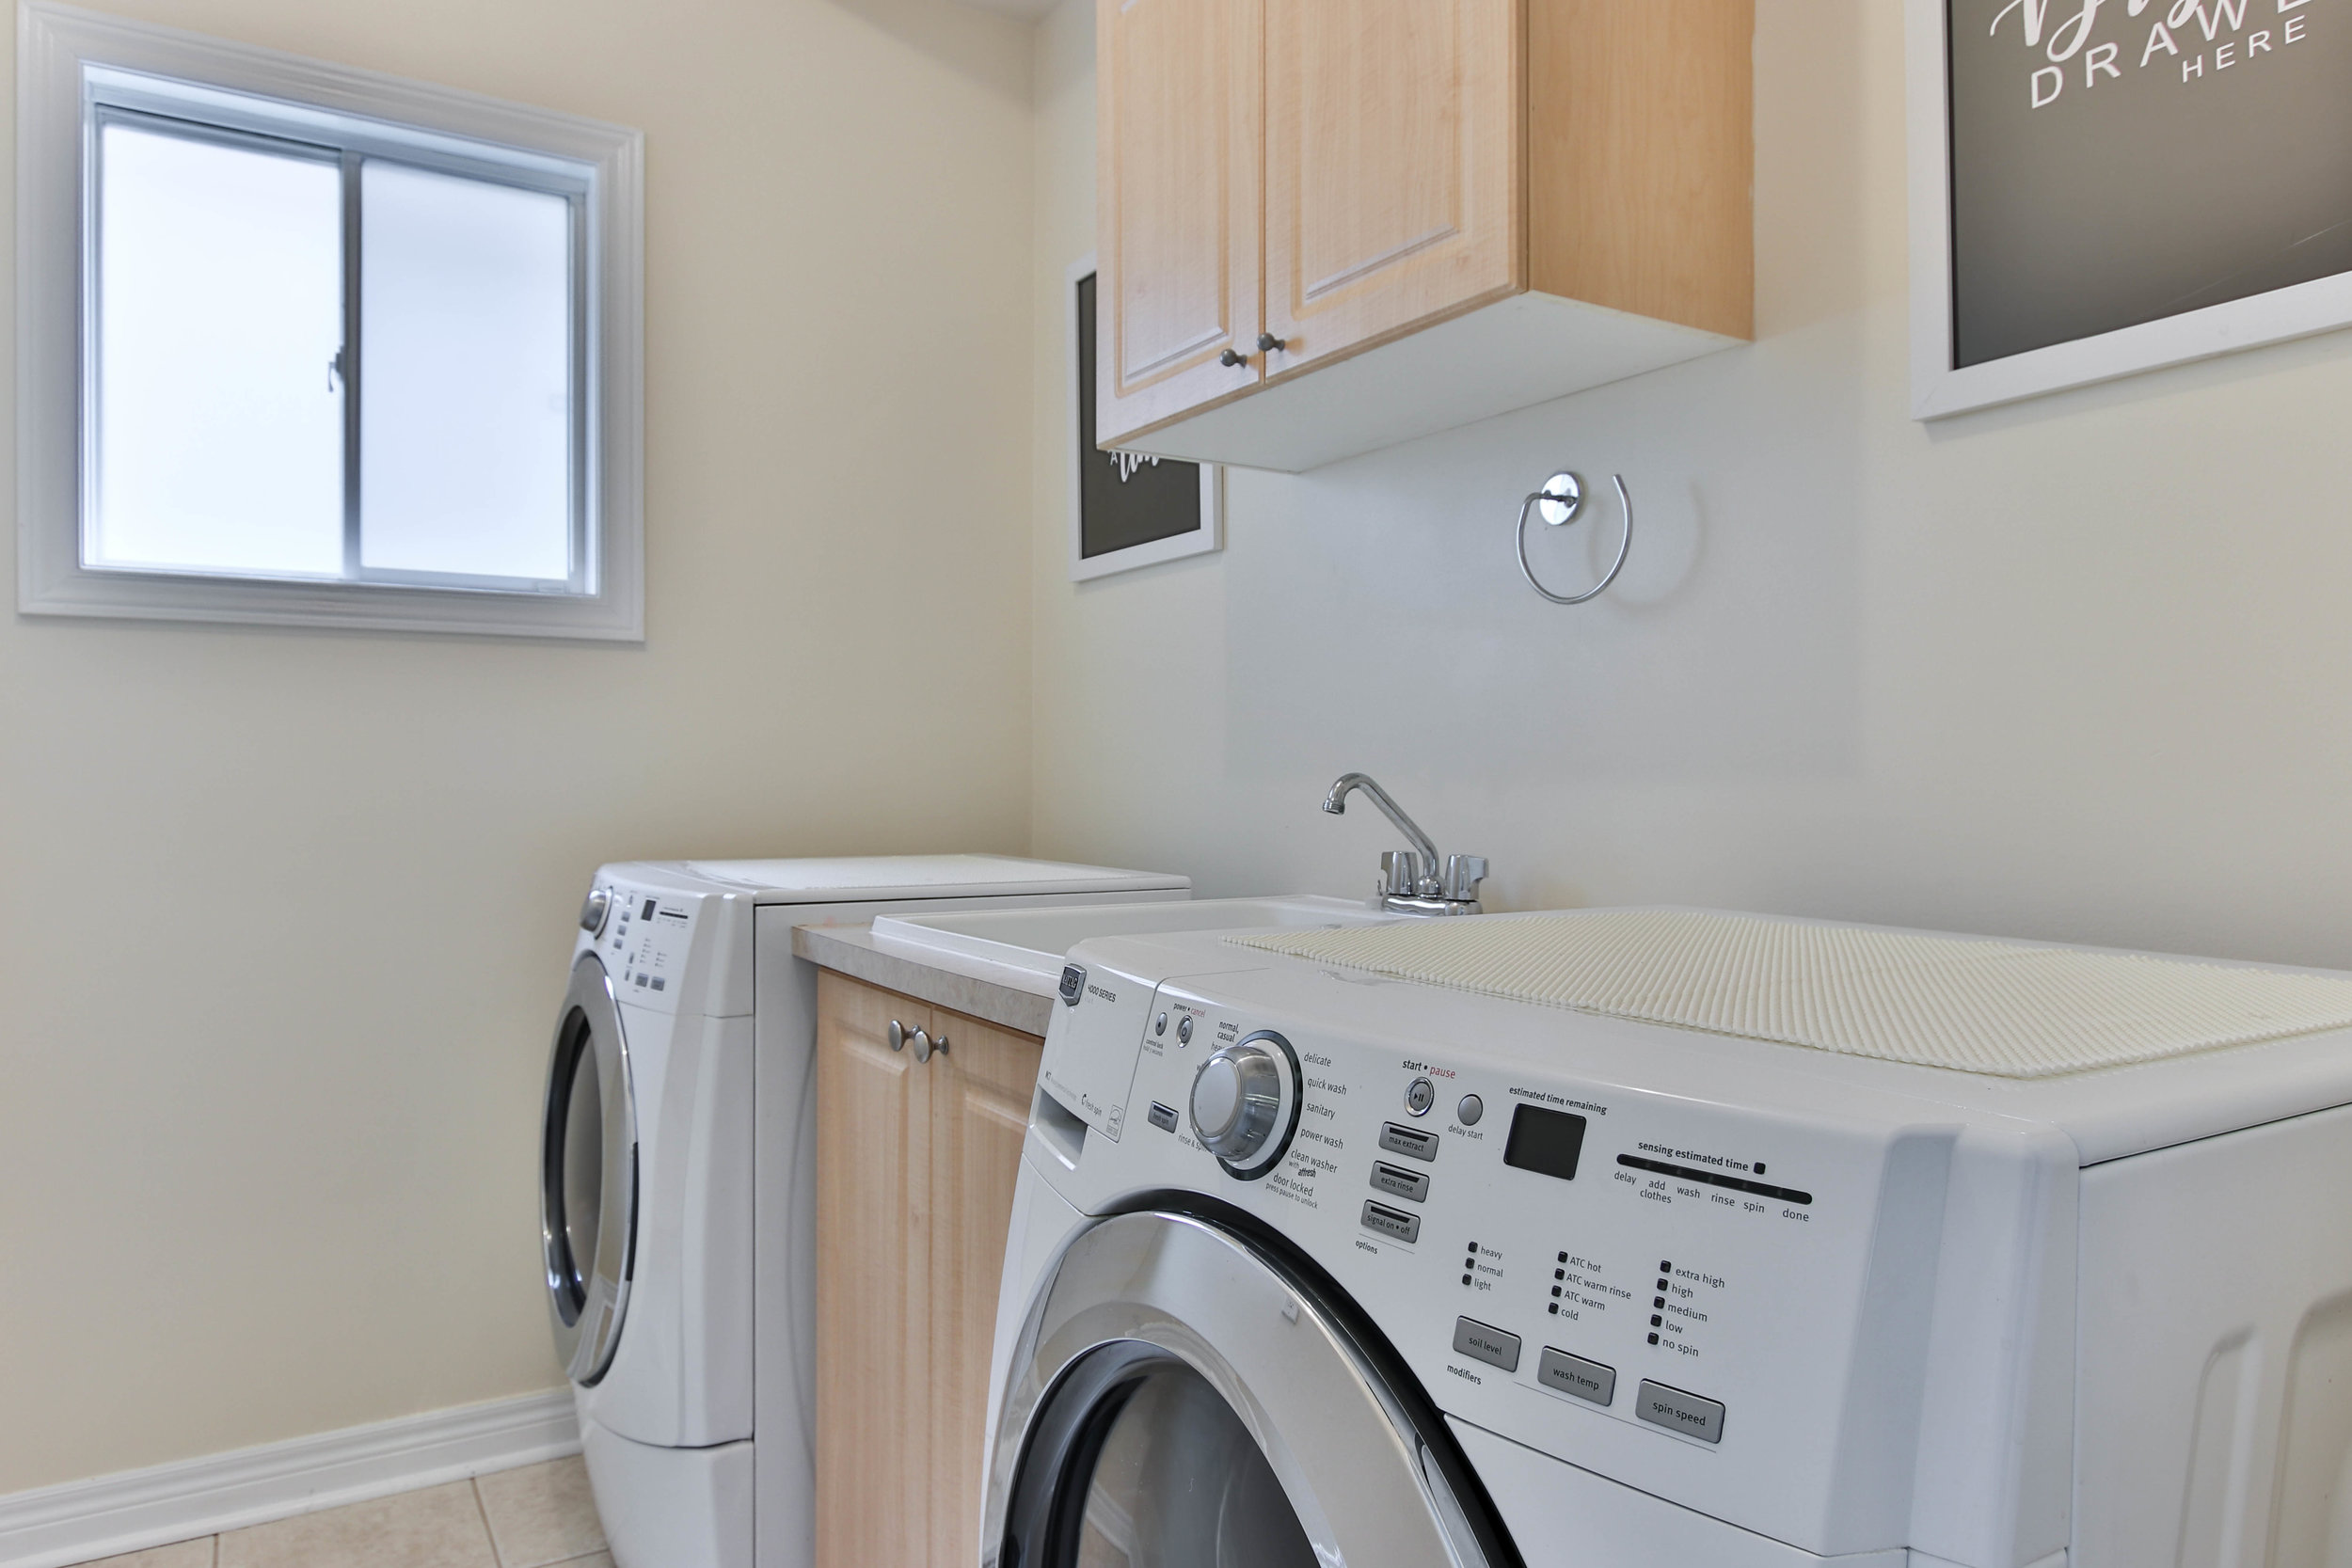 40_Laundry (1 of 1).jpg